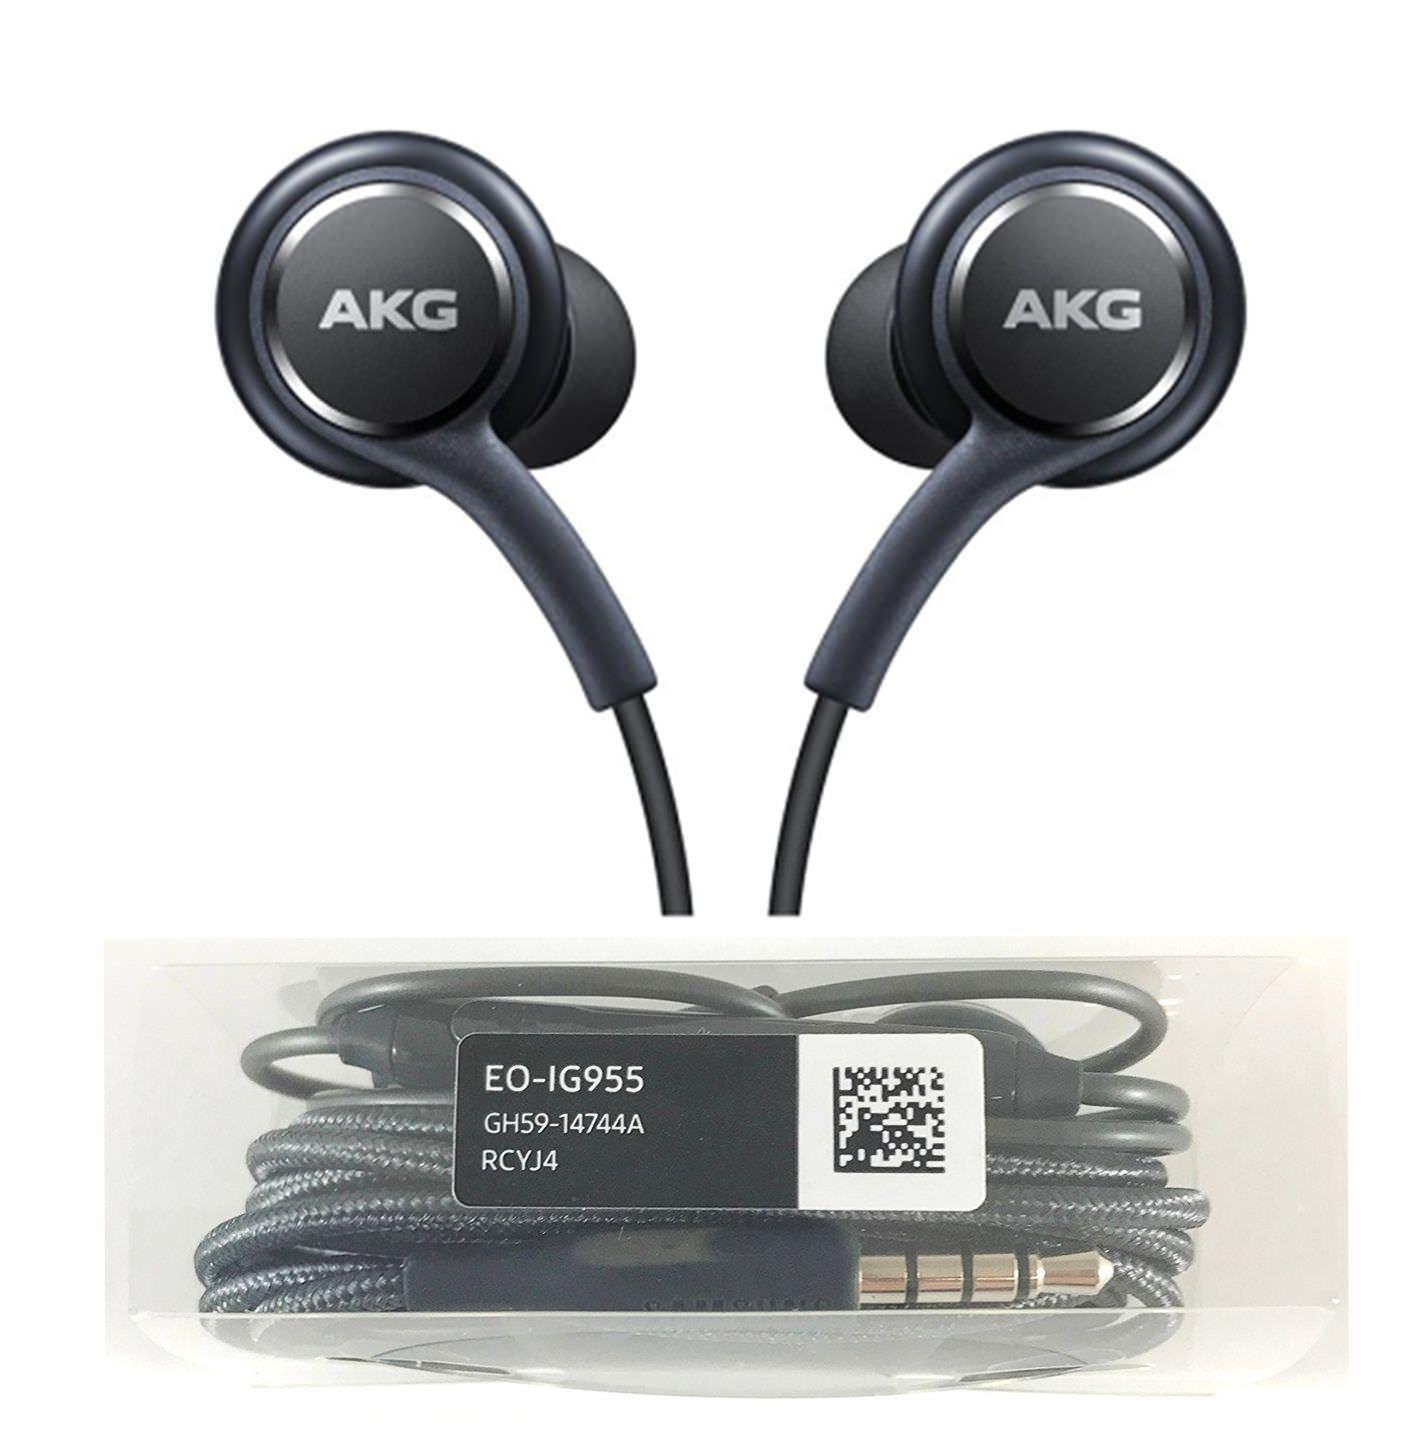 oem samsung akg earphones headphones headset galaxy s6 s7. Black Bedroom Furniture Sets. Home Design Ideas